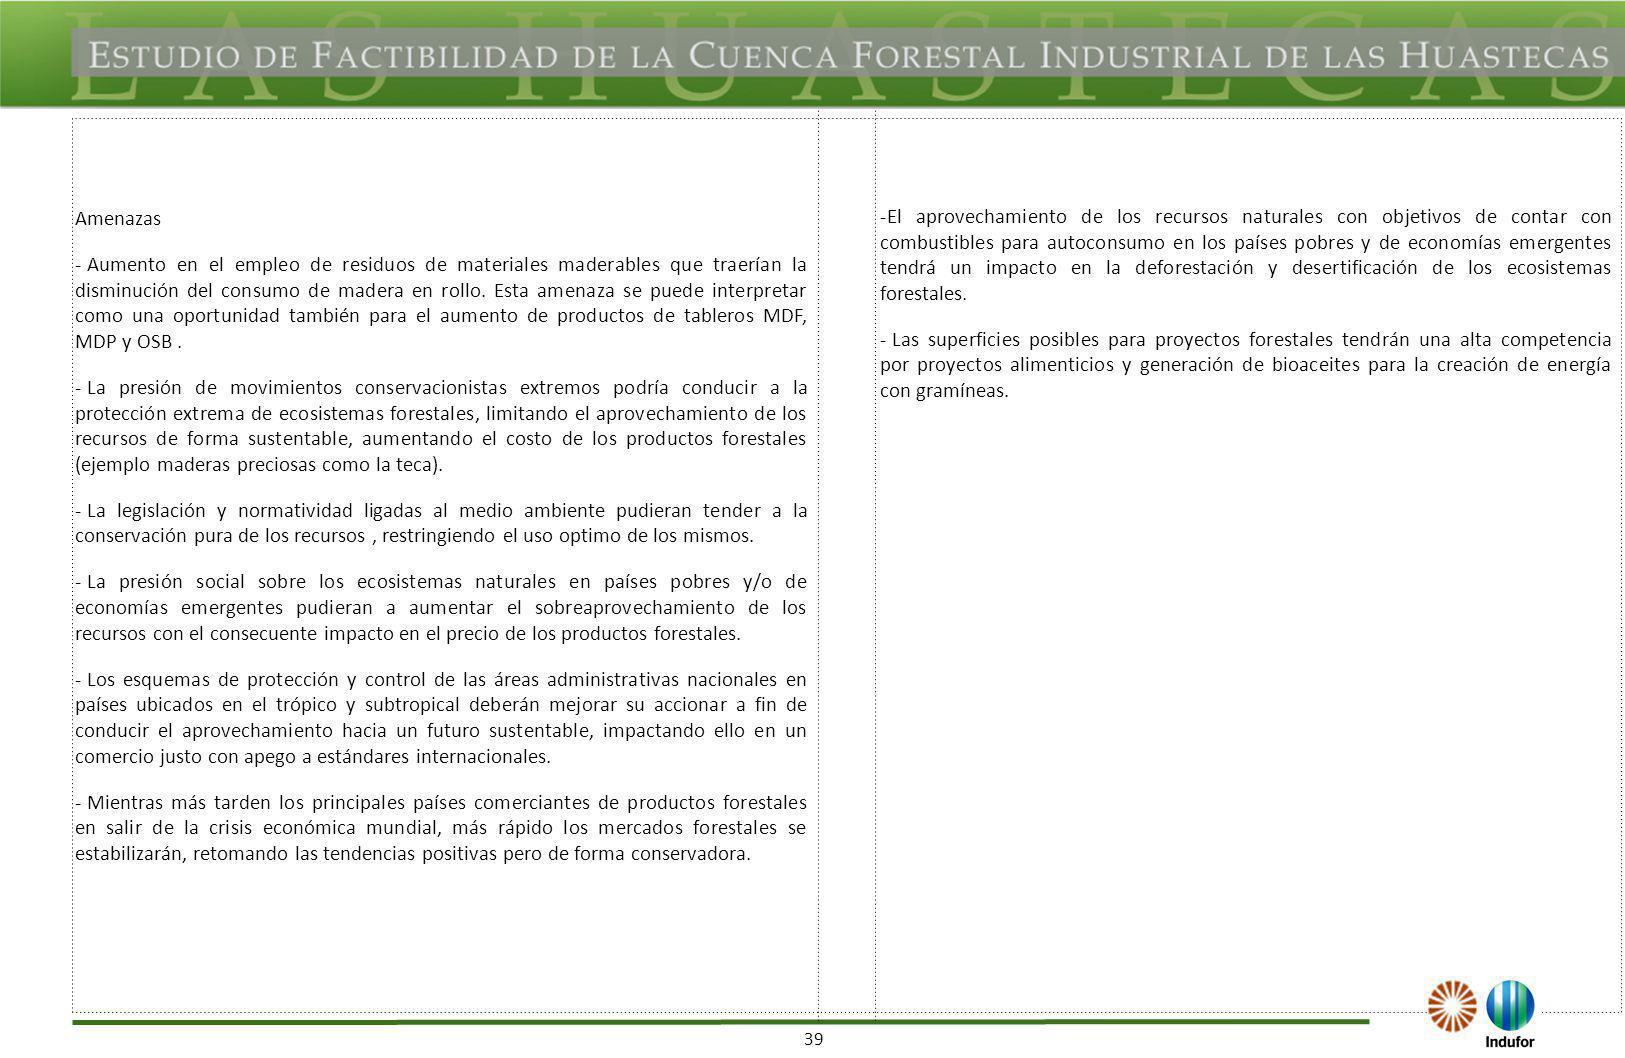 Foda Muebles De Madera - An Lisis Foda De Recurso Y Potencial Forestal Cap Iii Iv Vi Y [mjhdah]http://1.bp.blogspot.com/-ywhvp_M63Sg/UYf1jg7PPdI/AAAAAAAAALY/GHXMUYiLuNY/s1600/yyyy.png